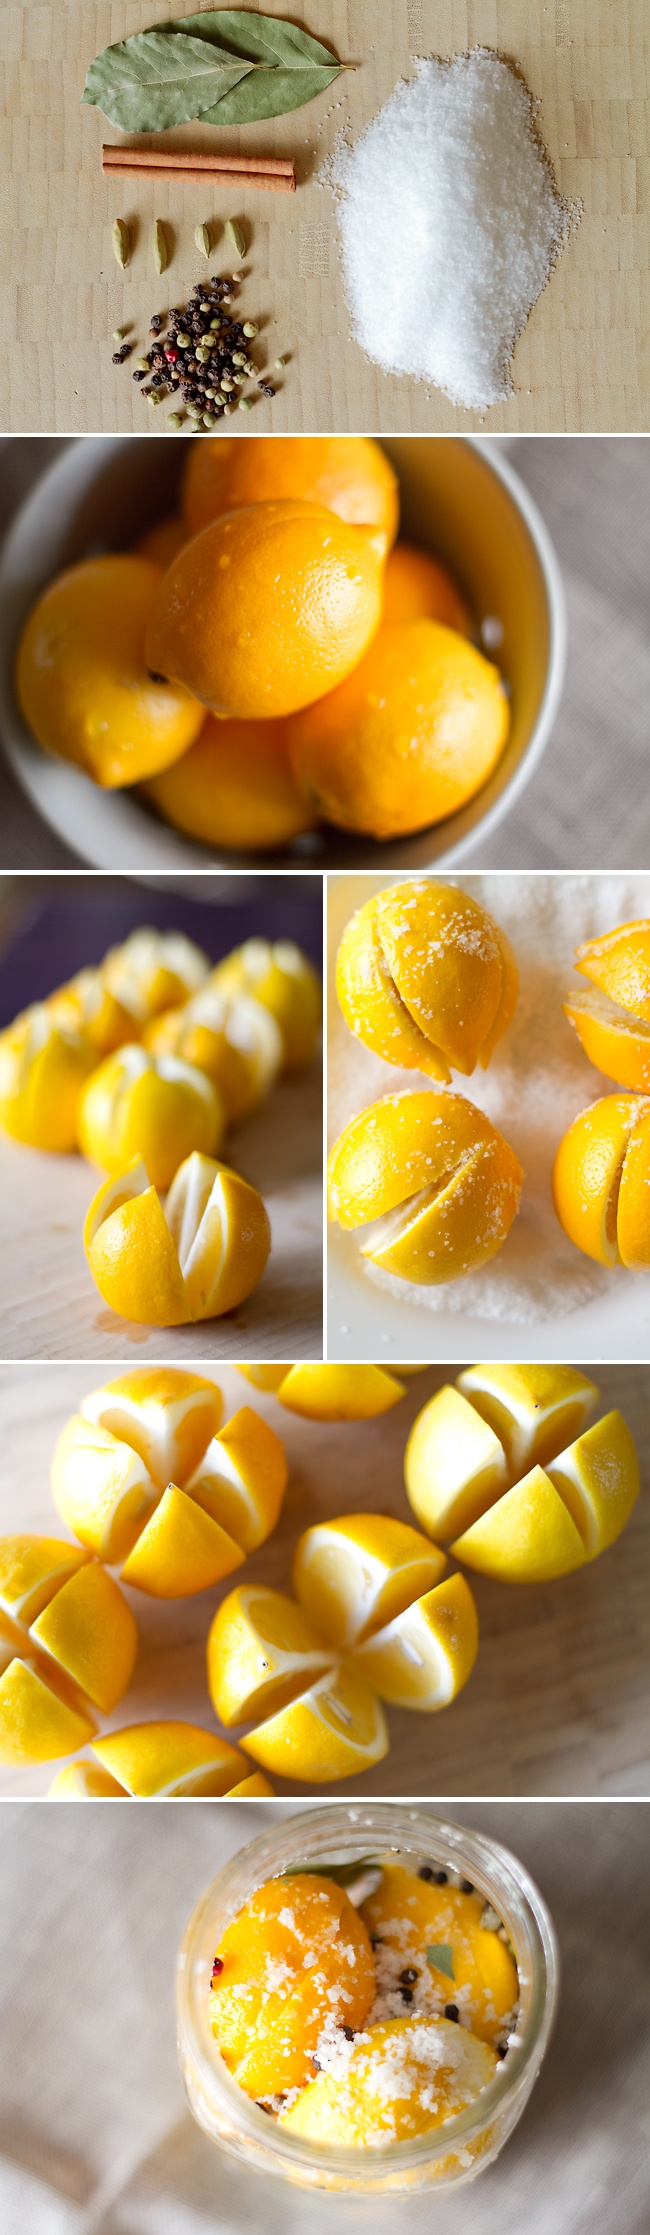 : Preserved Meyer Lemons ] SixOneSeven puts together a new preserve ...